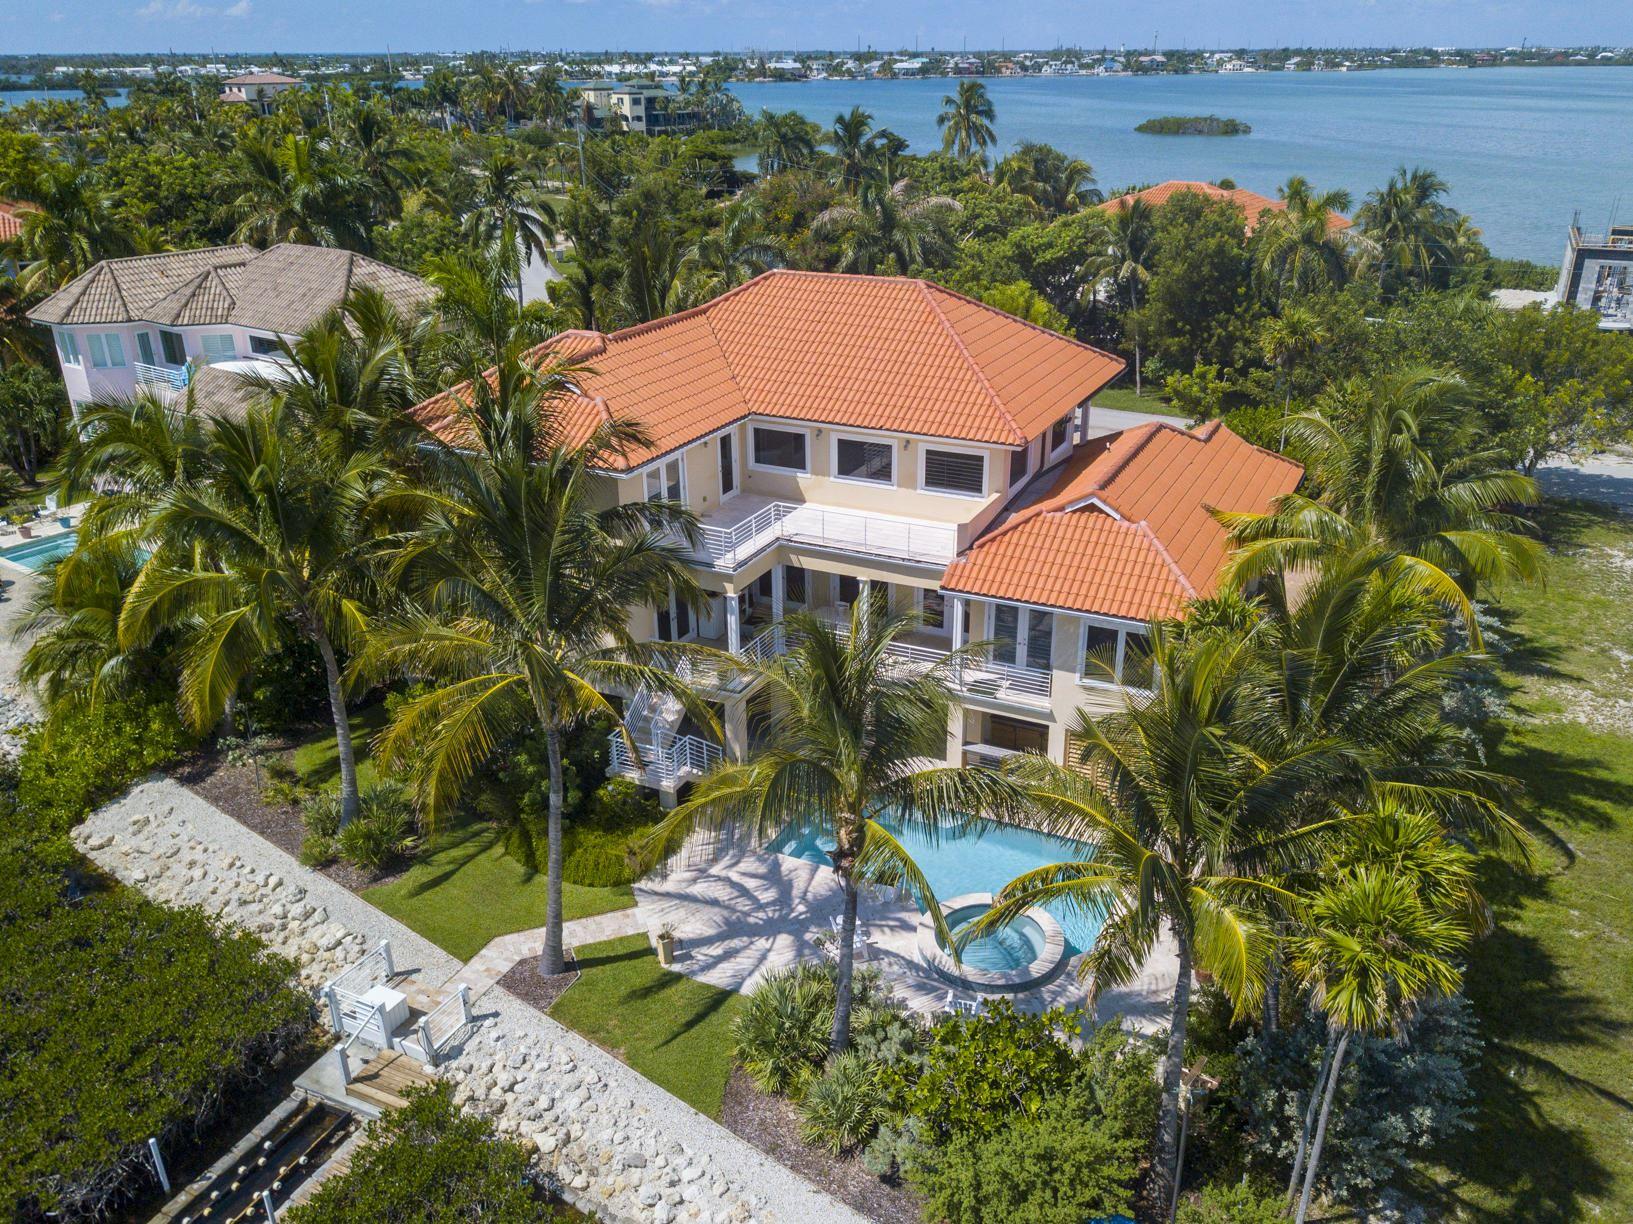 41 Cannon Royal Drive, Key West, FL 33040 - #: 591510